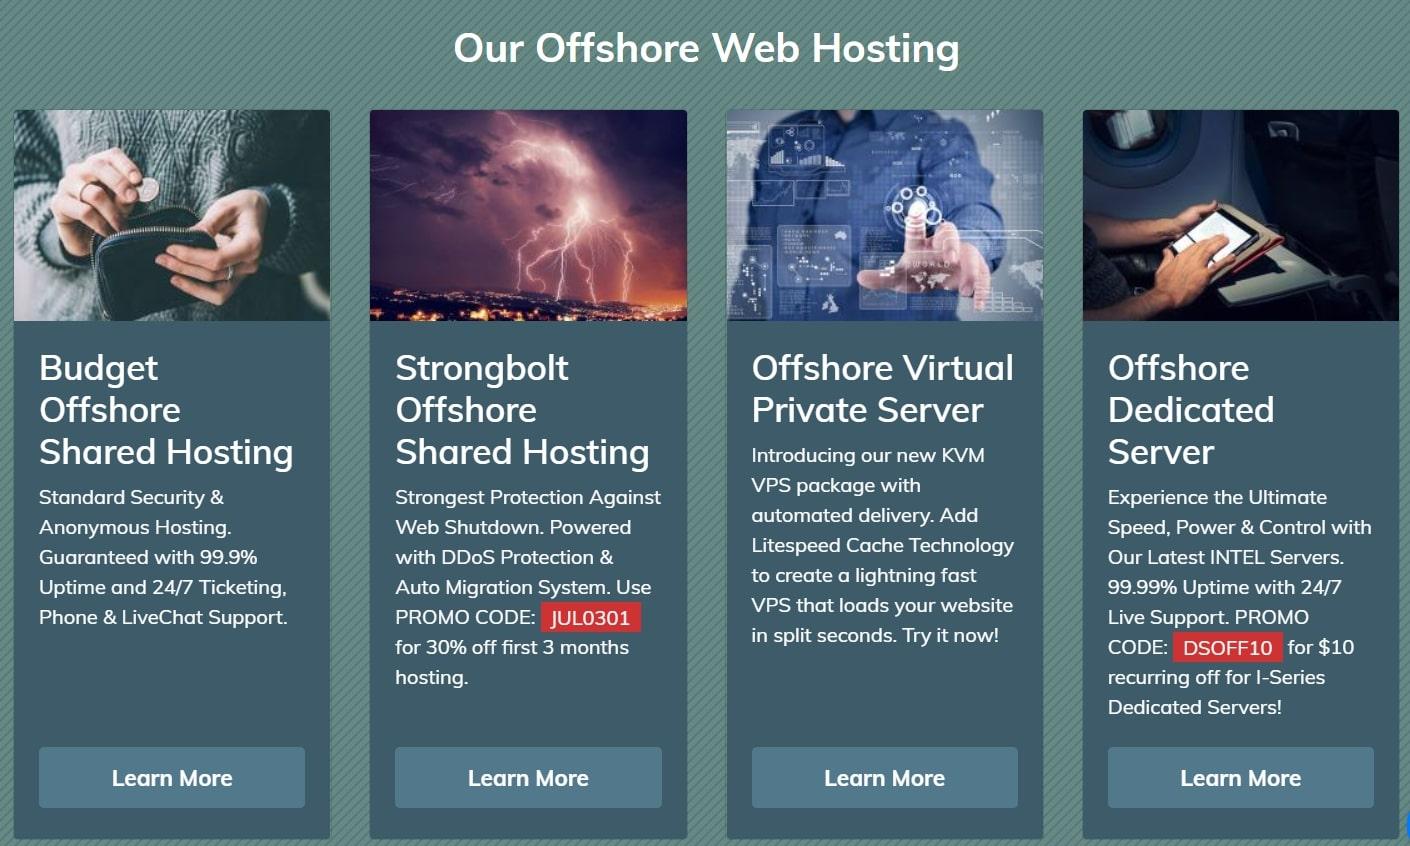 Shinjiru's options for offshore web hosting